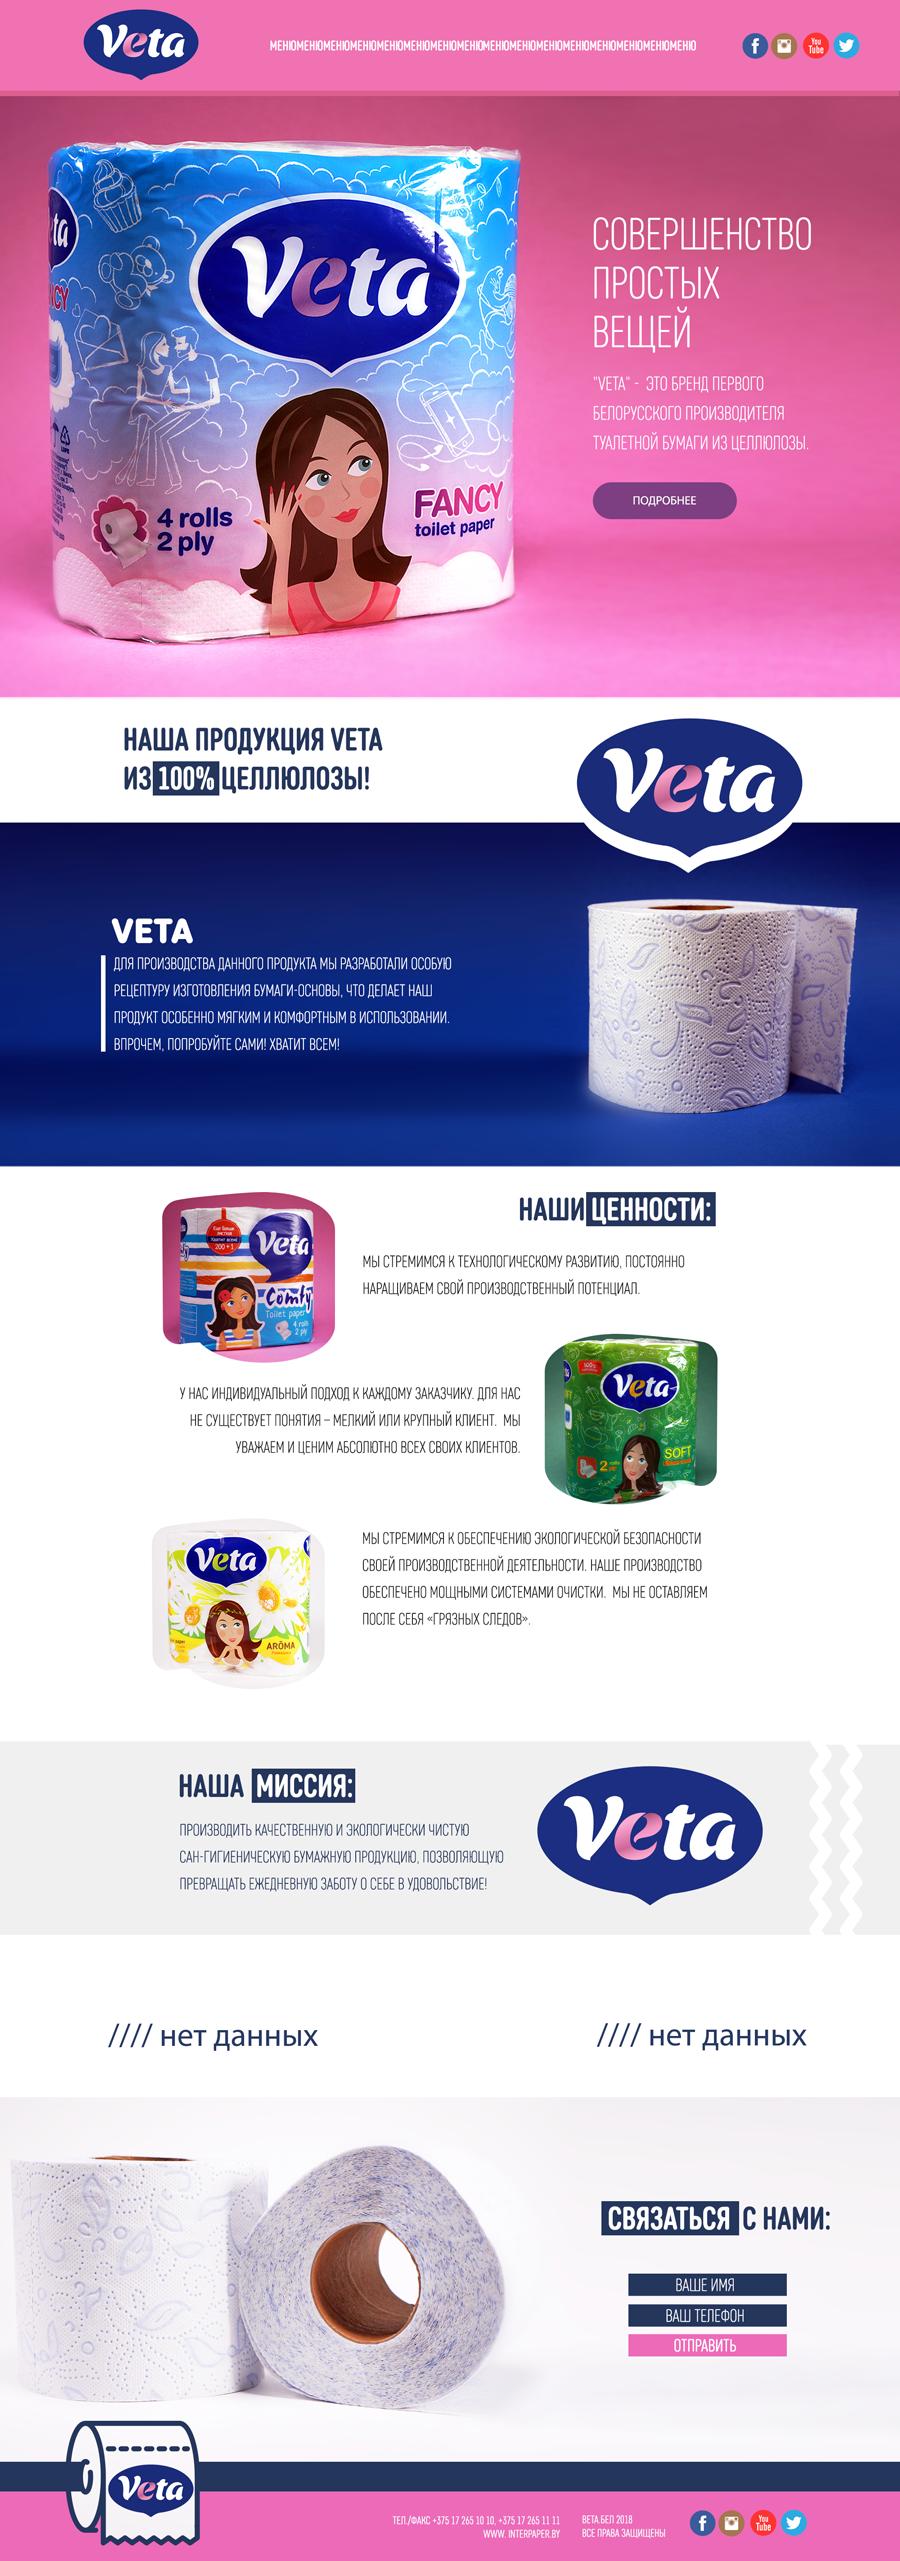 Дизайн и разработка лендинга Veta